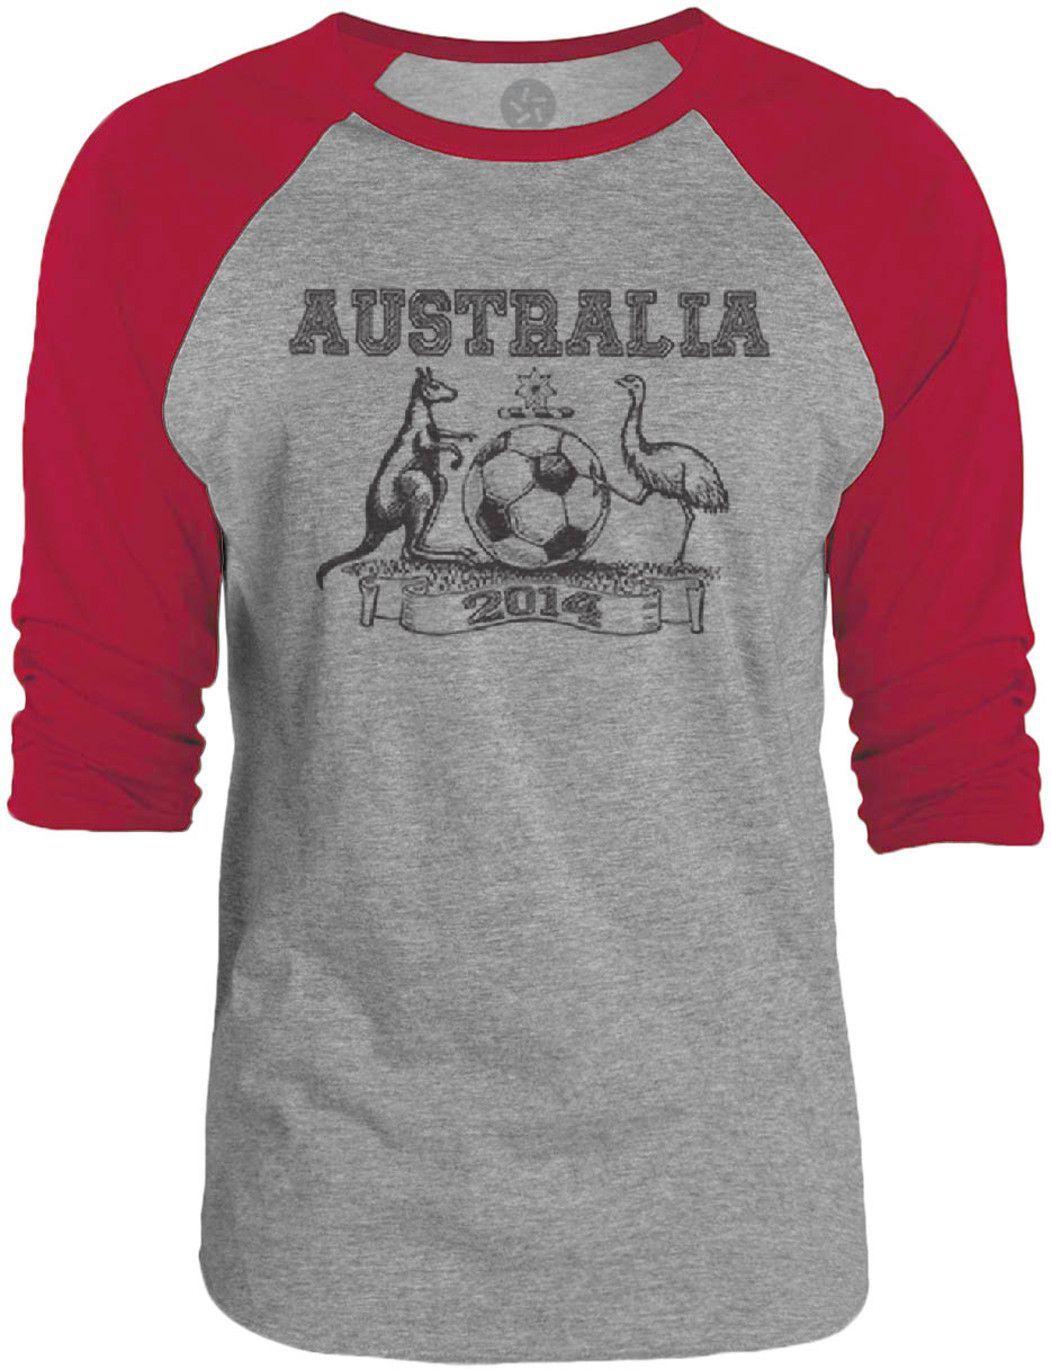 Big Texas Australia 2014 (Black) 3/4-Sleeve Raglan Baseball T-Shirt